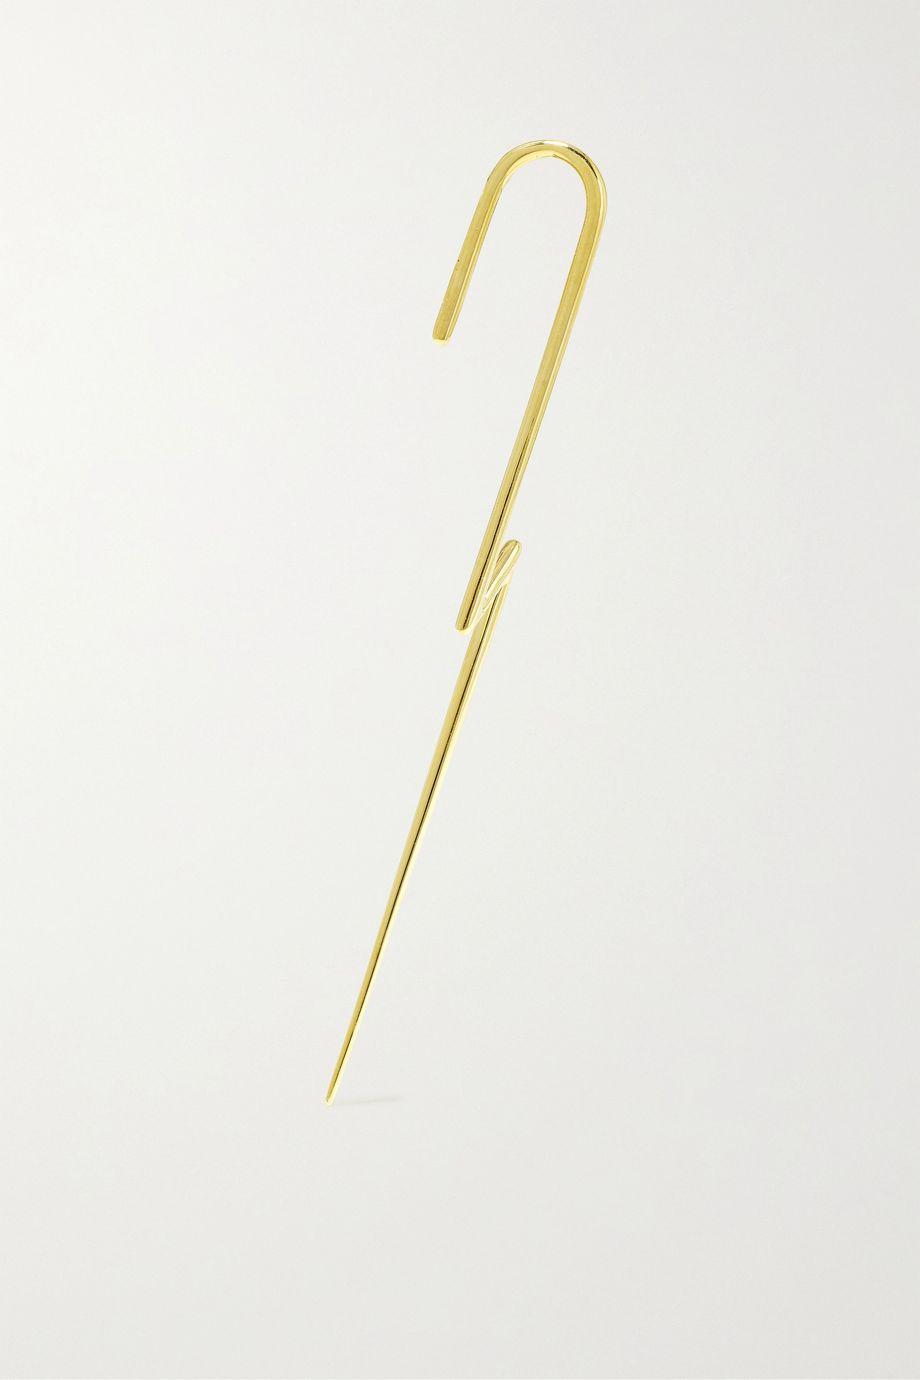 KATKIM Flash gold ear pin